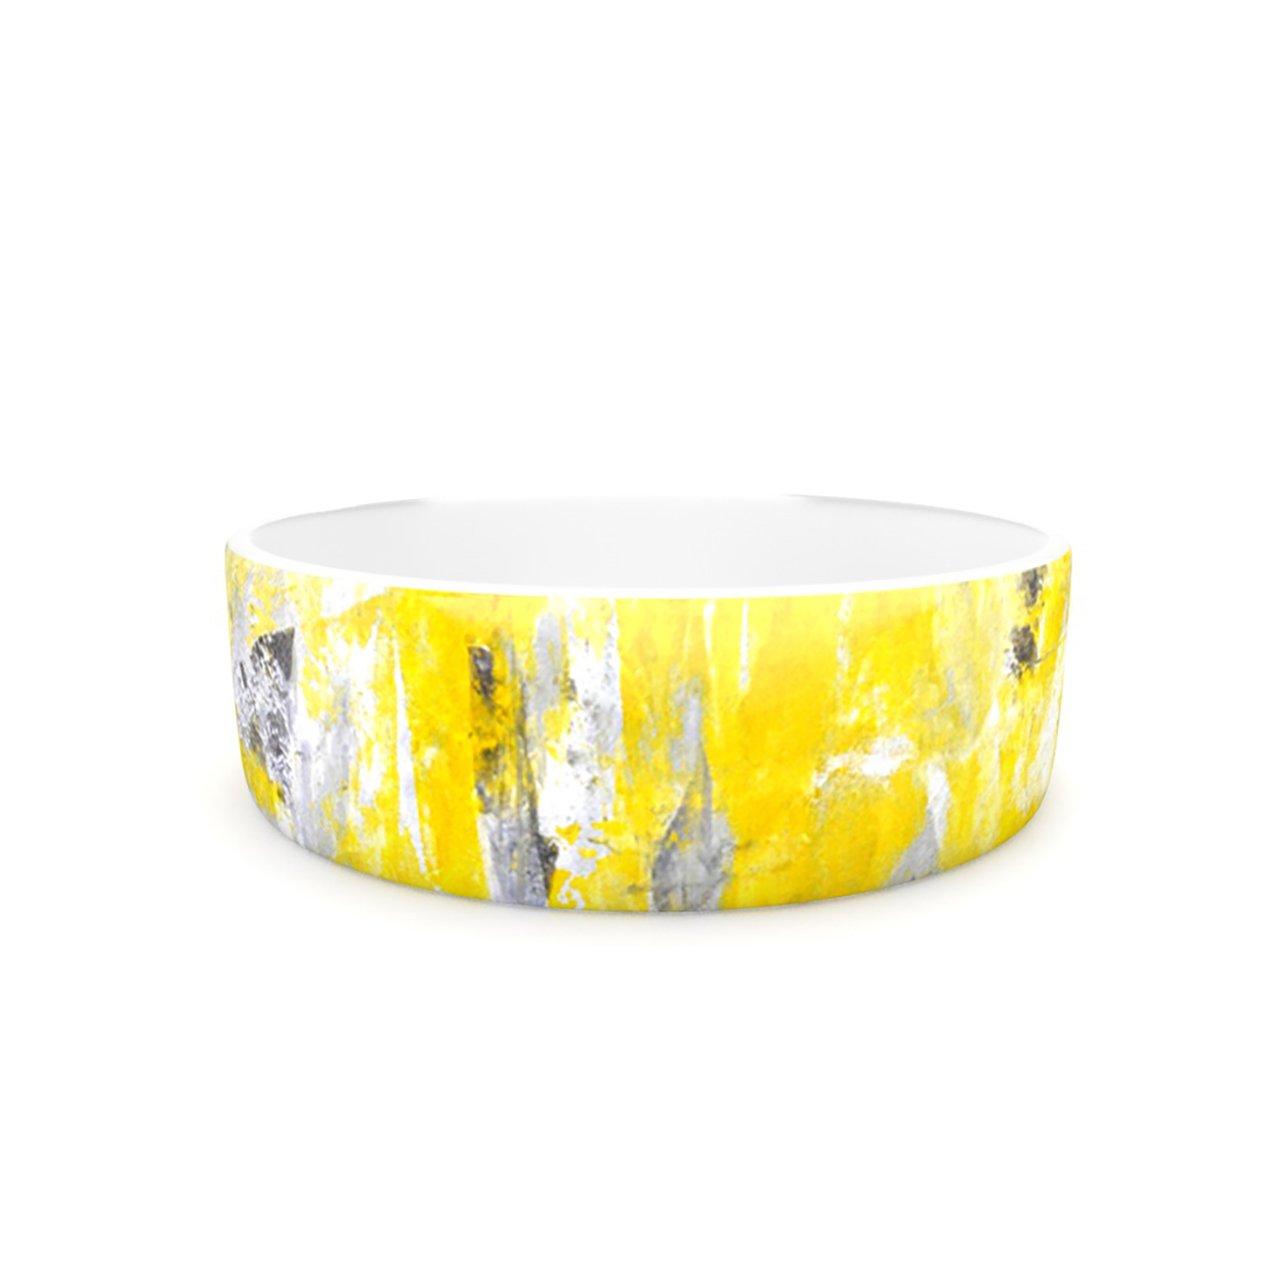 Kess InHouse CarolLynn Tice Picking Around  Pet Bowl, 7-Inch, Yellow